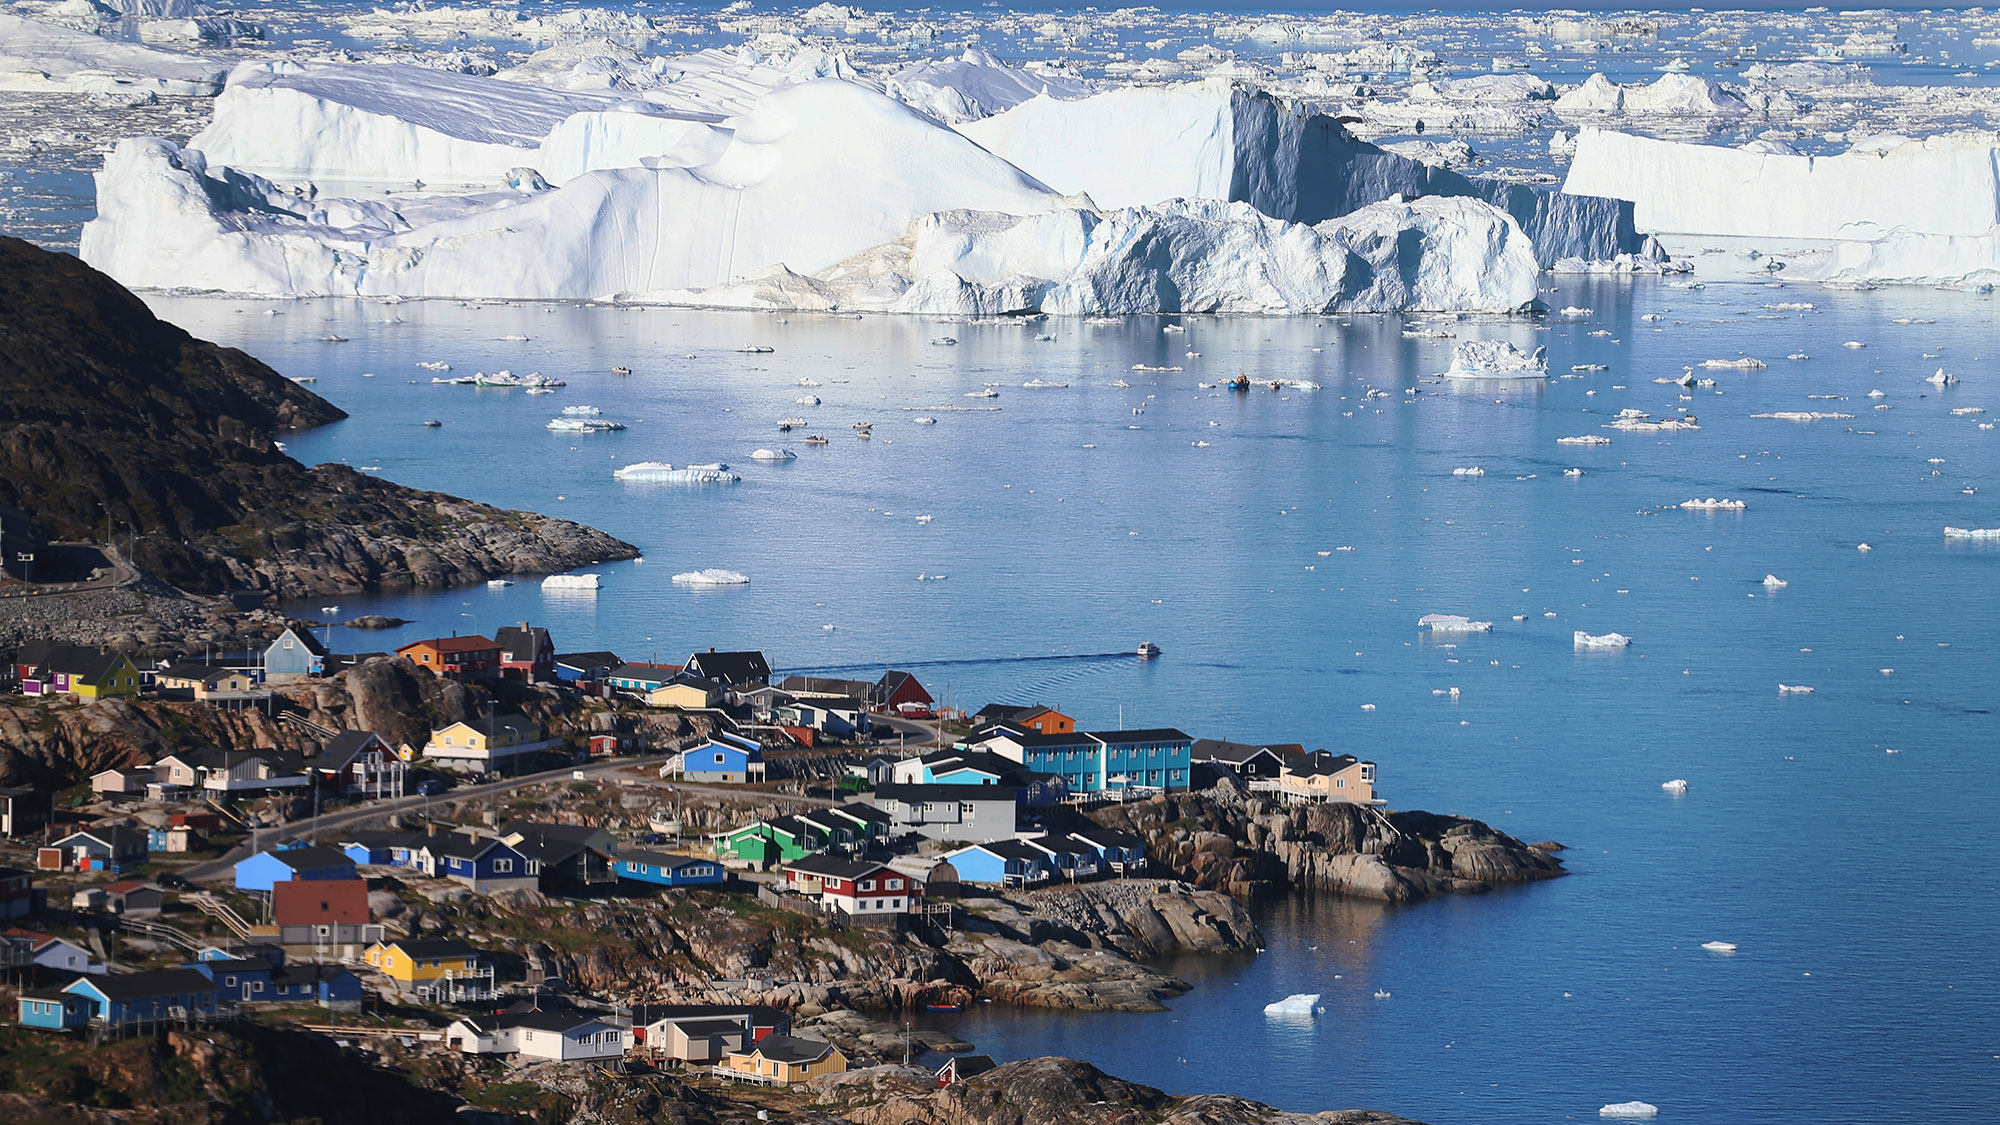 Greenland Lost 217 Billion Tons of Ice Last Month